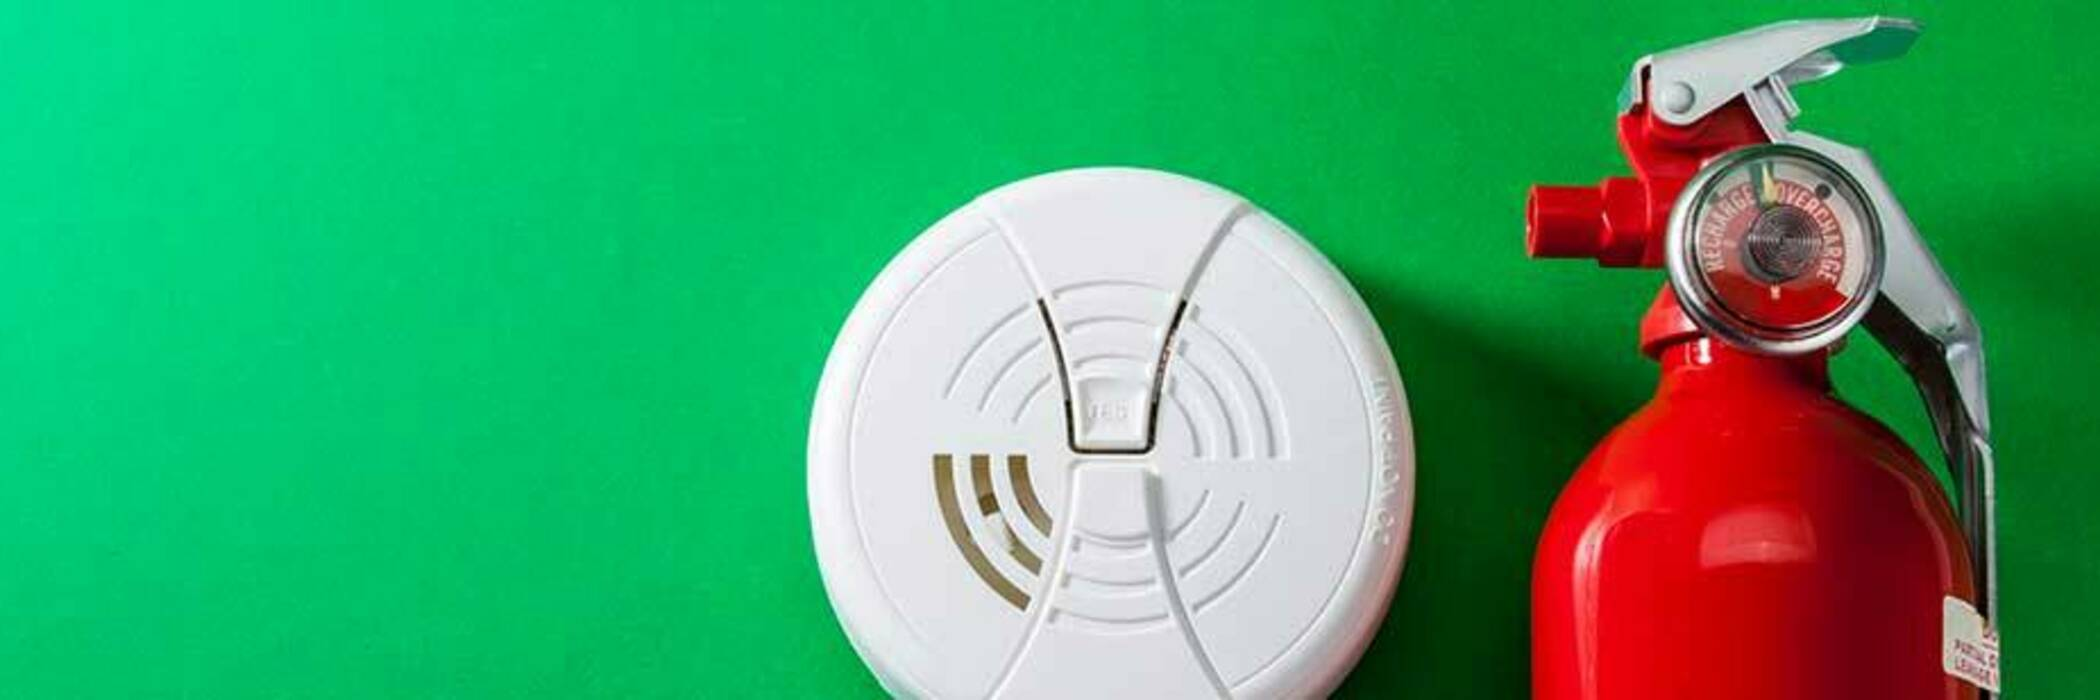 Smoke alarm and fire extinguisher.